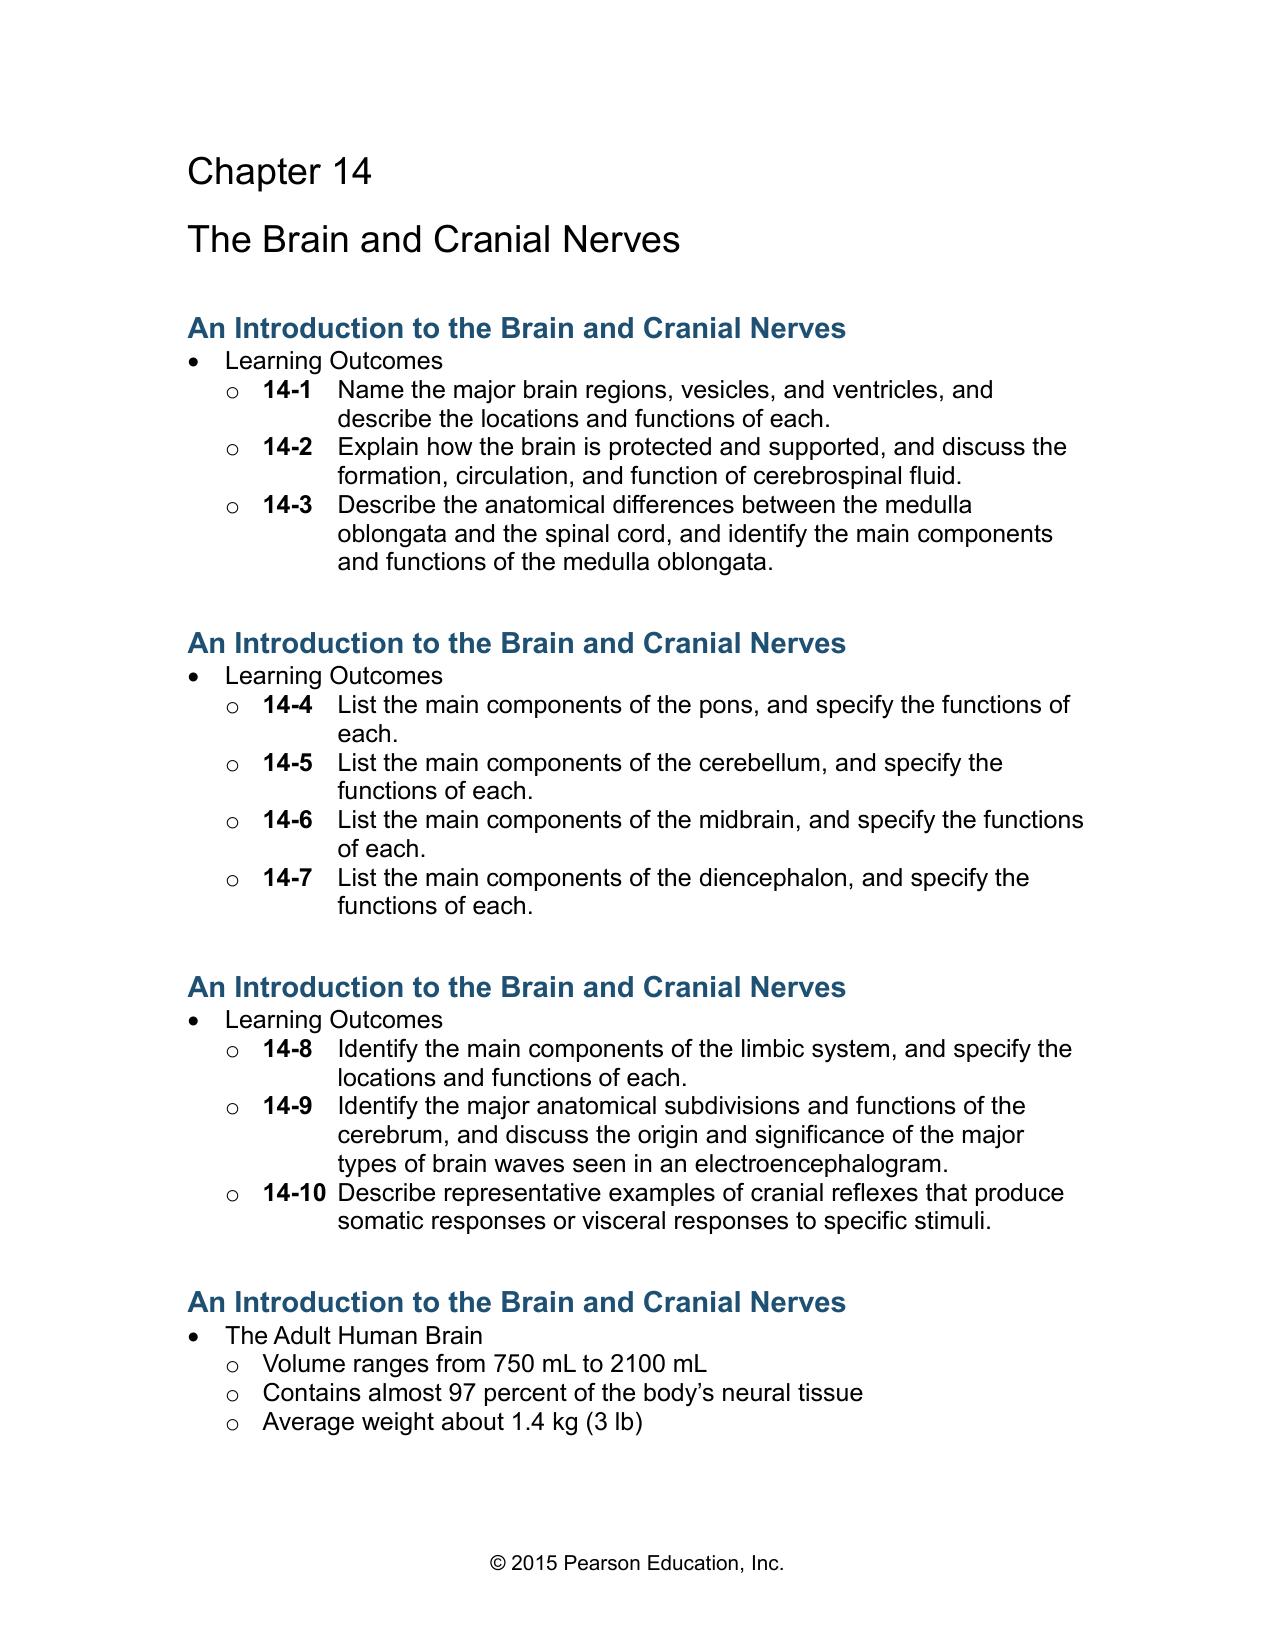 14-10 Cranial Nerves